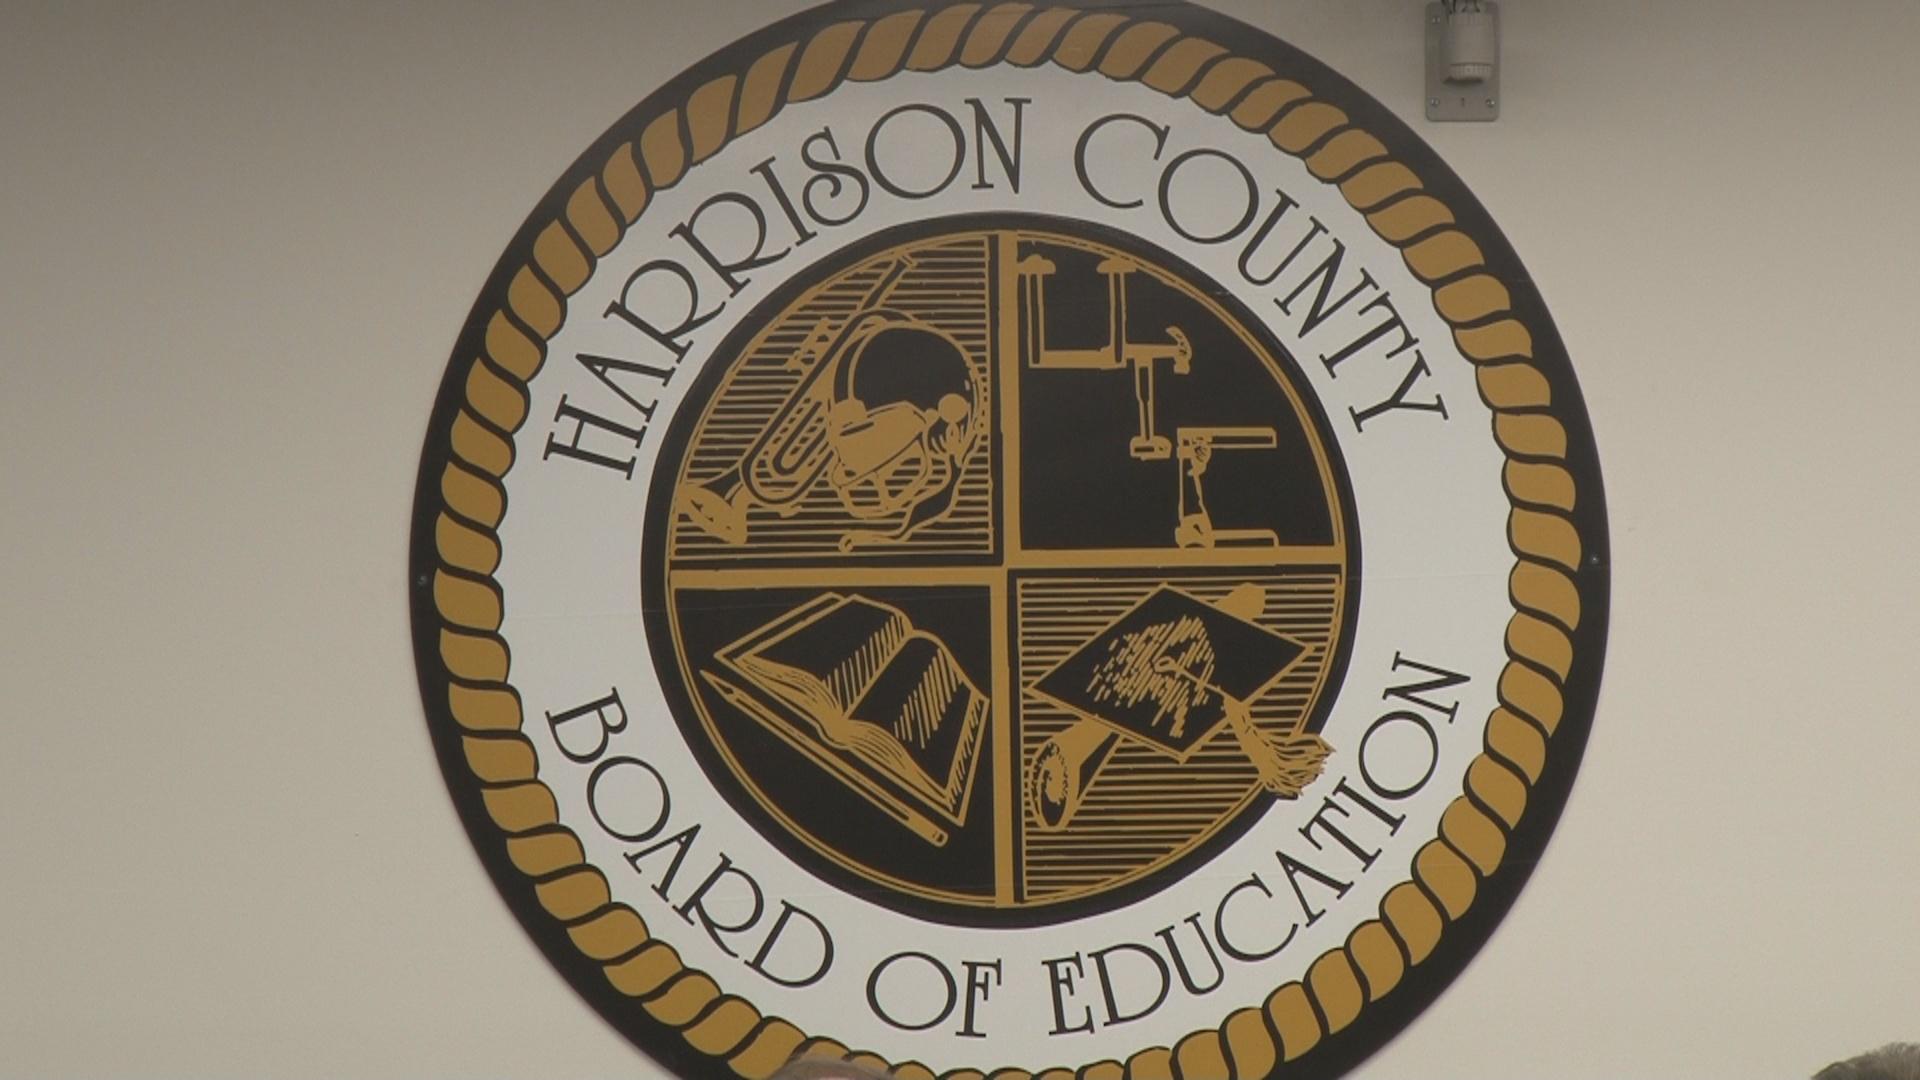 Harrison County BOE 10.3.17_1514940949207.jpg.jpg